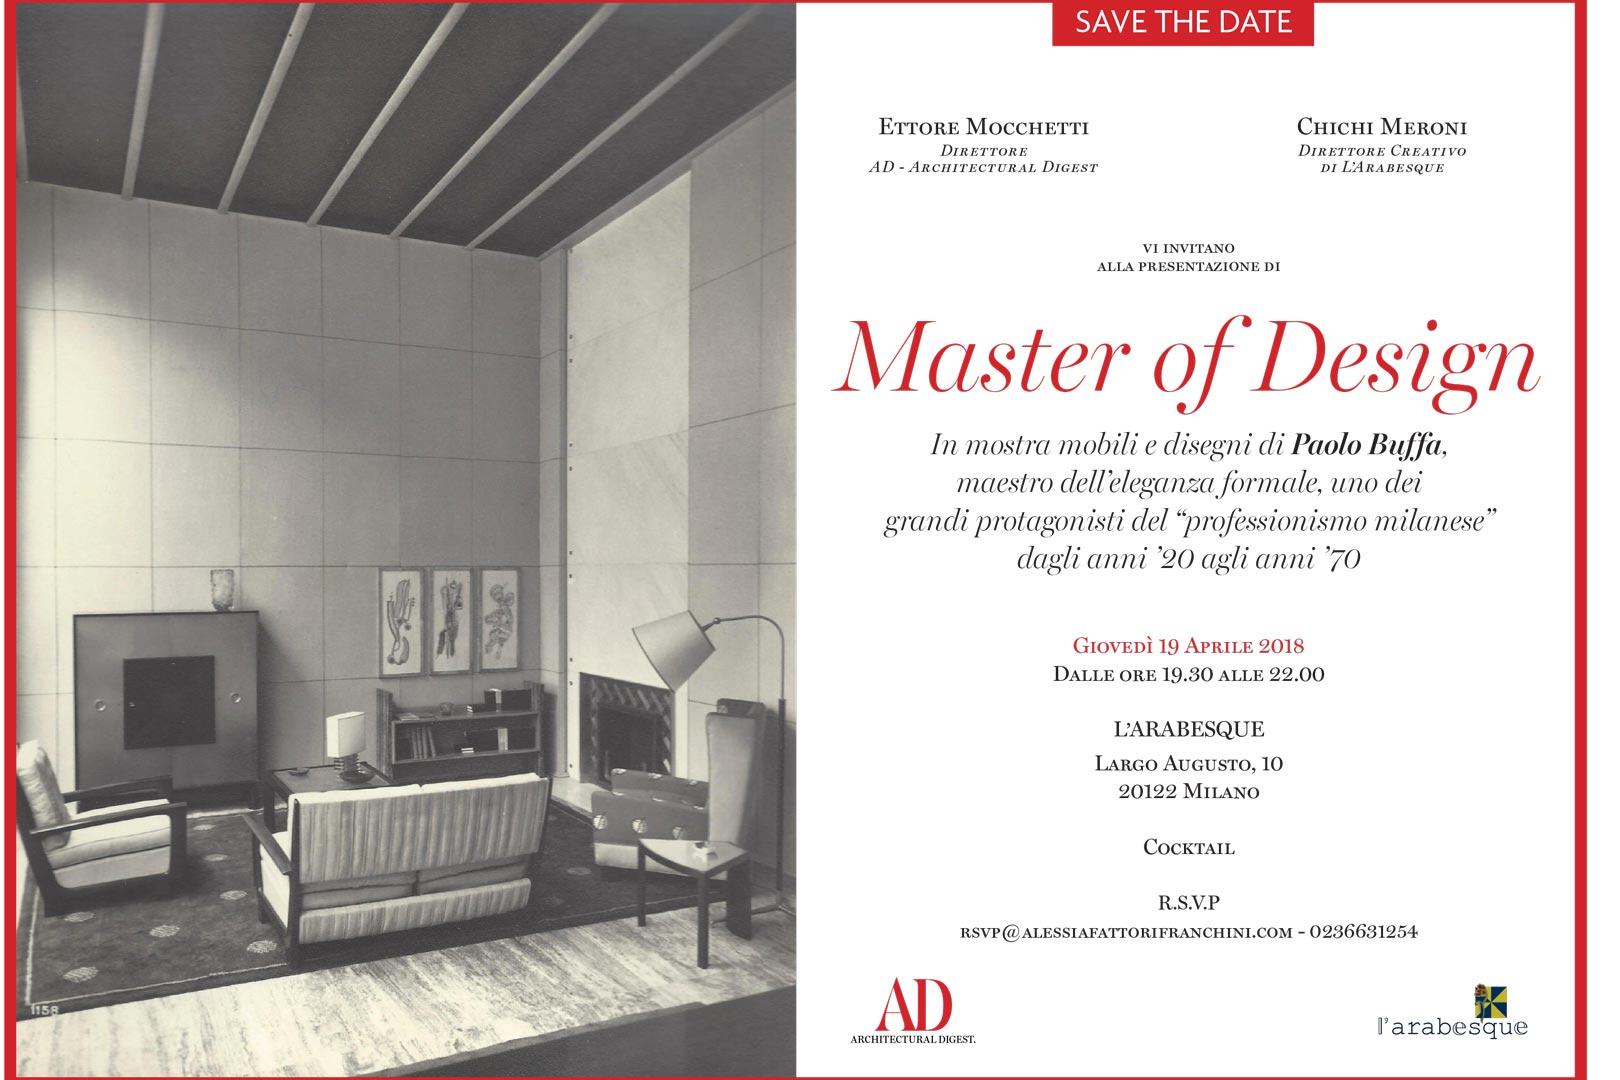 mddw2018-master-of-design